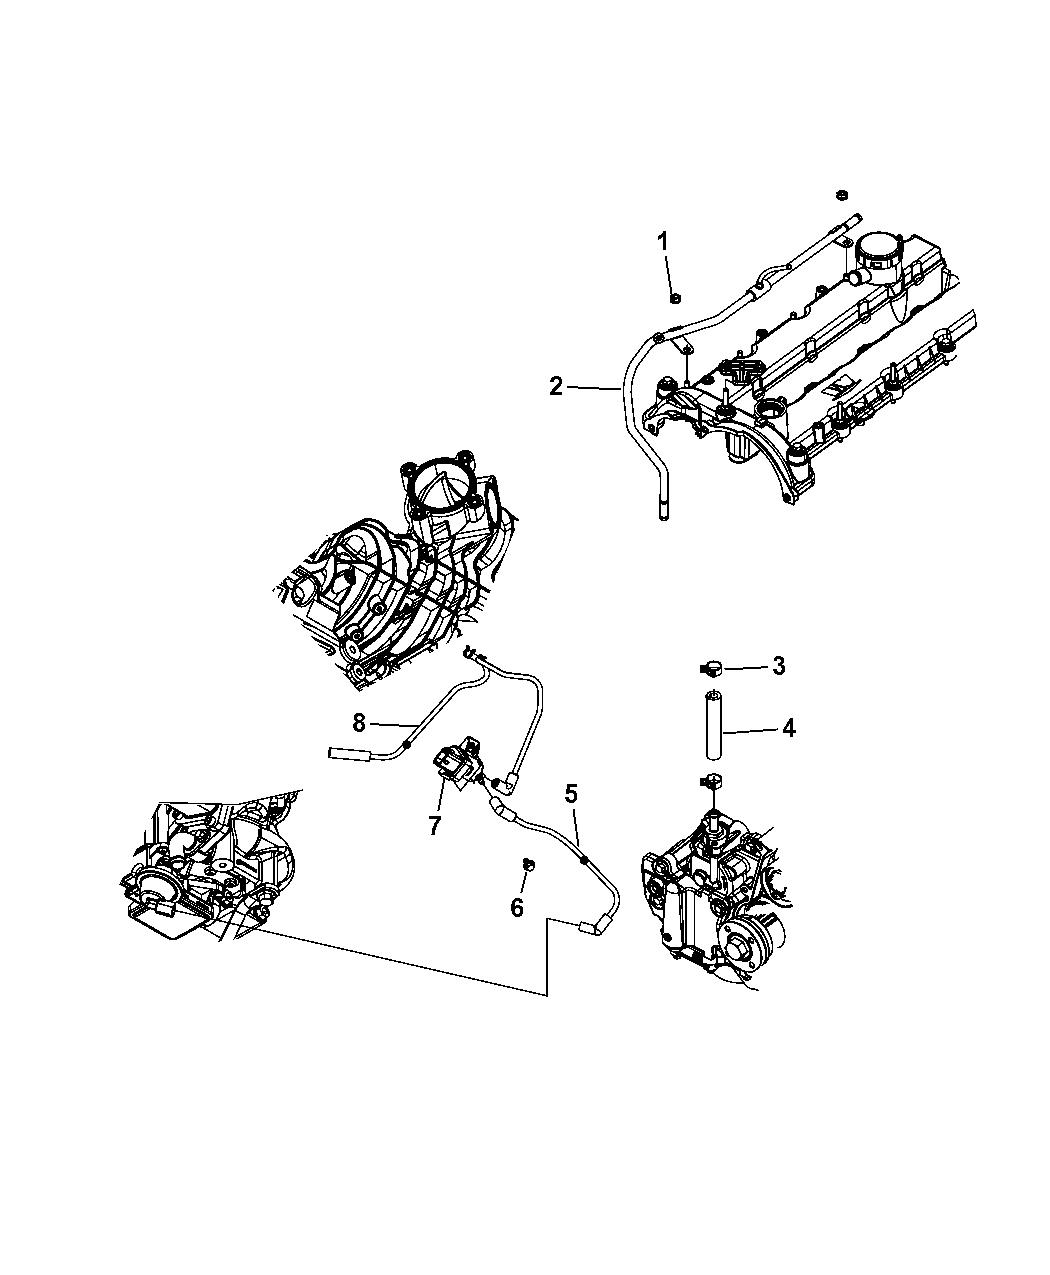 2012 Jeep Wrangler Vacuum Pump Harness